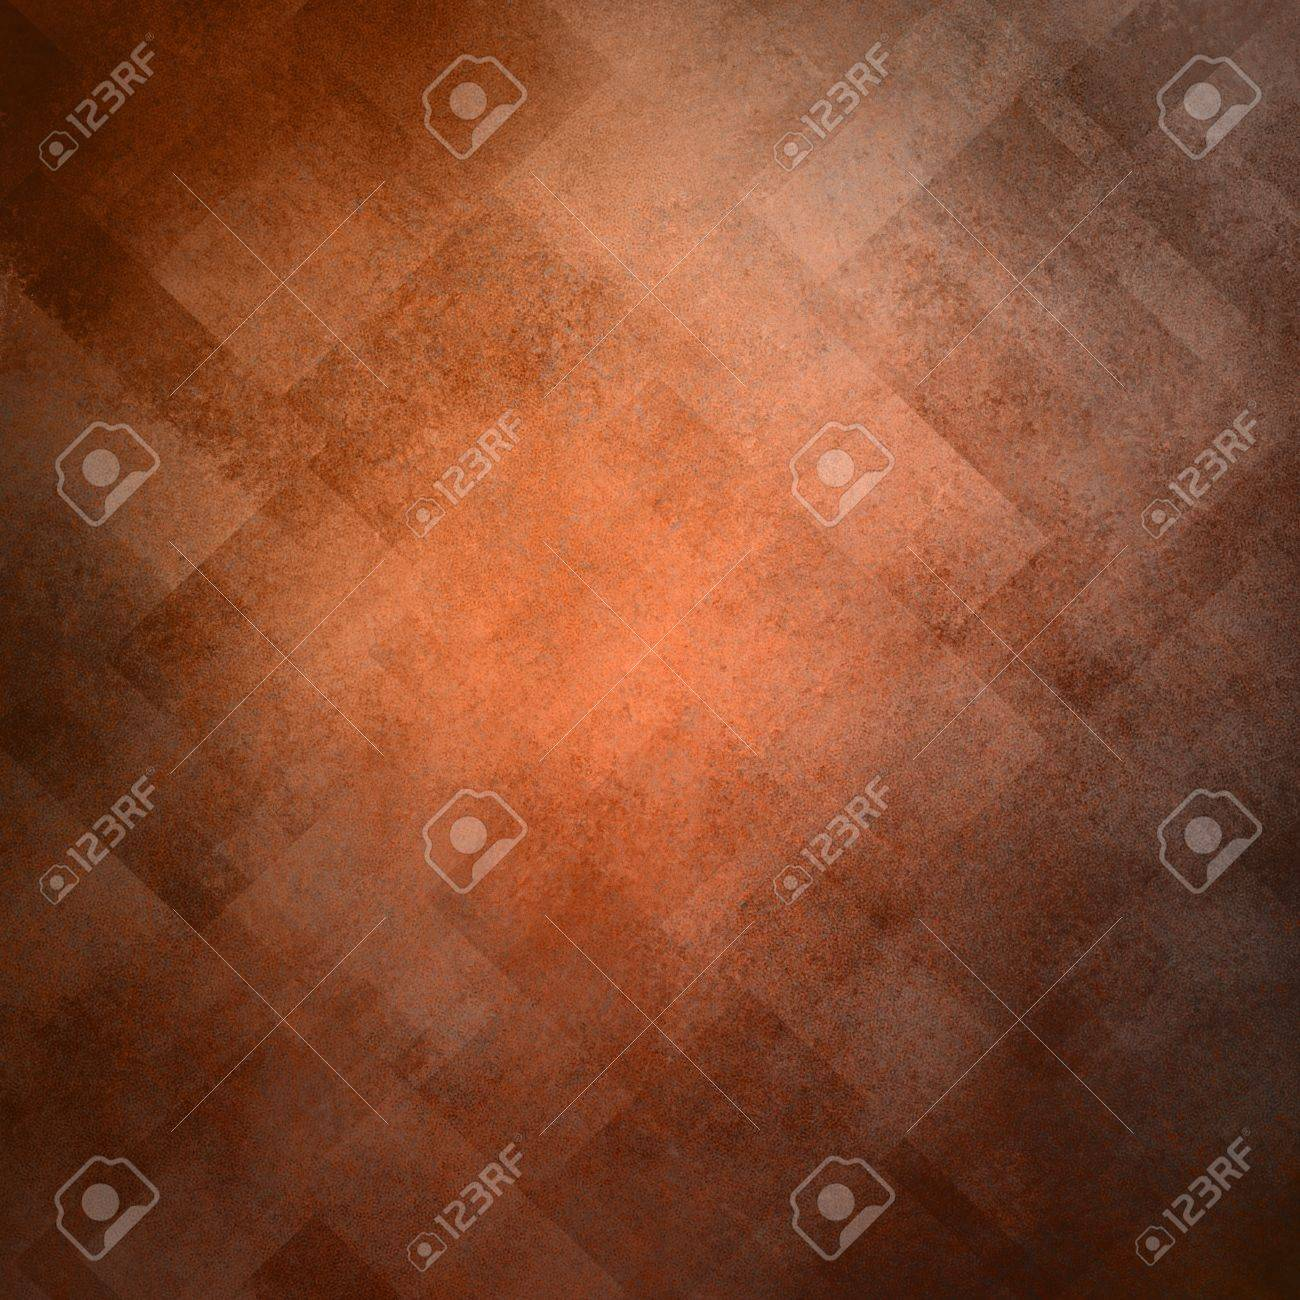 abstract orange background image pattern design on old vintage grunge background texture Stock Photo - 17960982